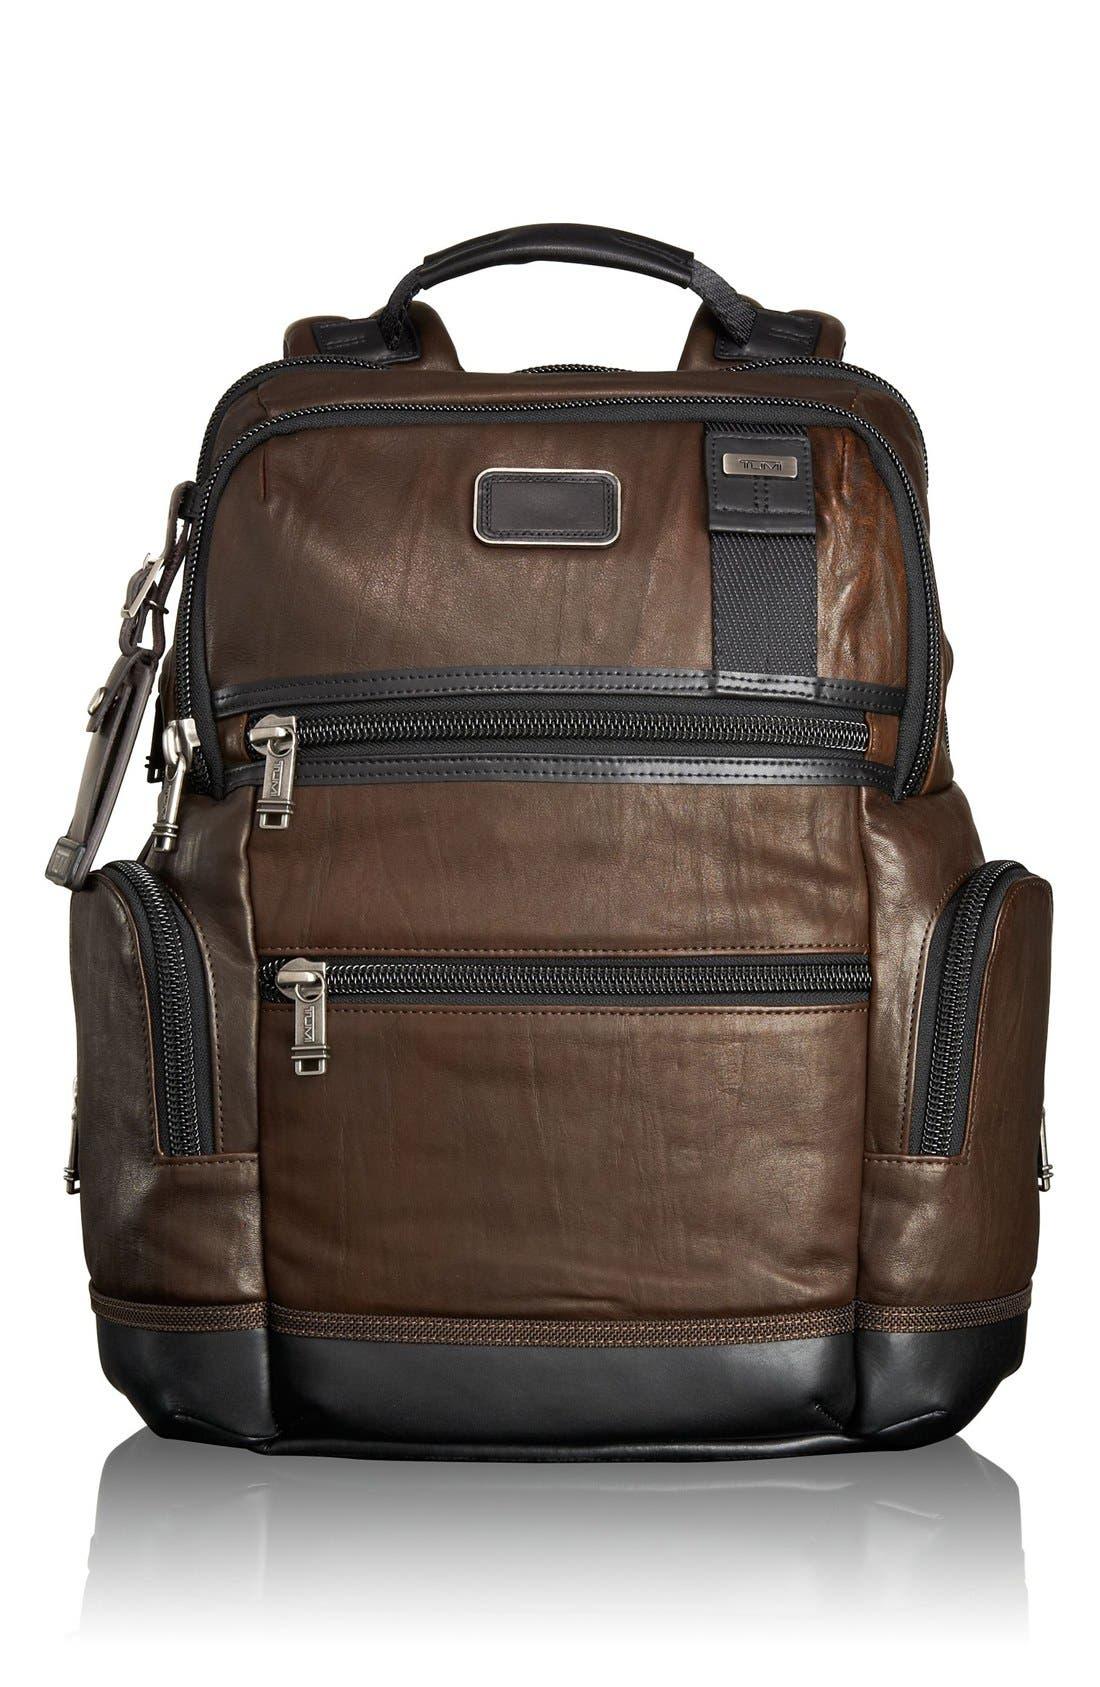 Alternate Image 1 Selected - Tumi 'Bravo - Knox' Leather Backpack